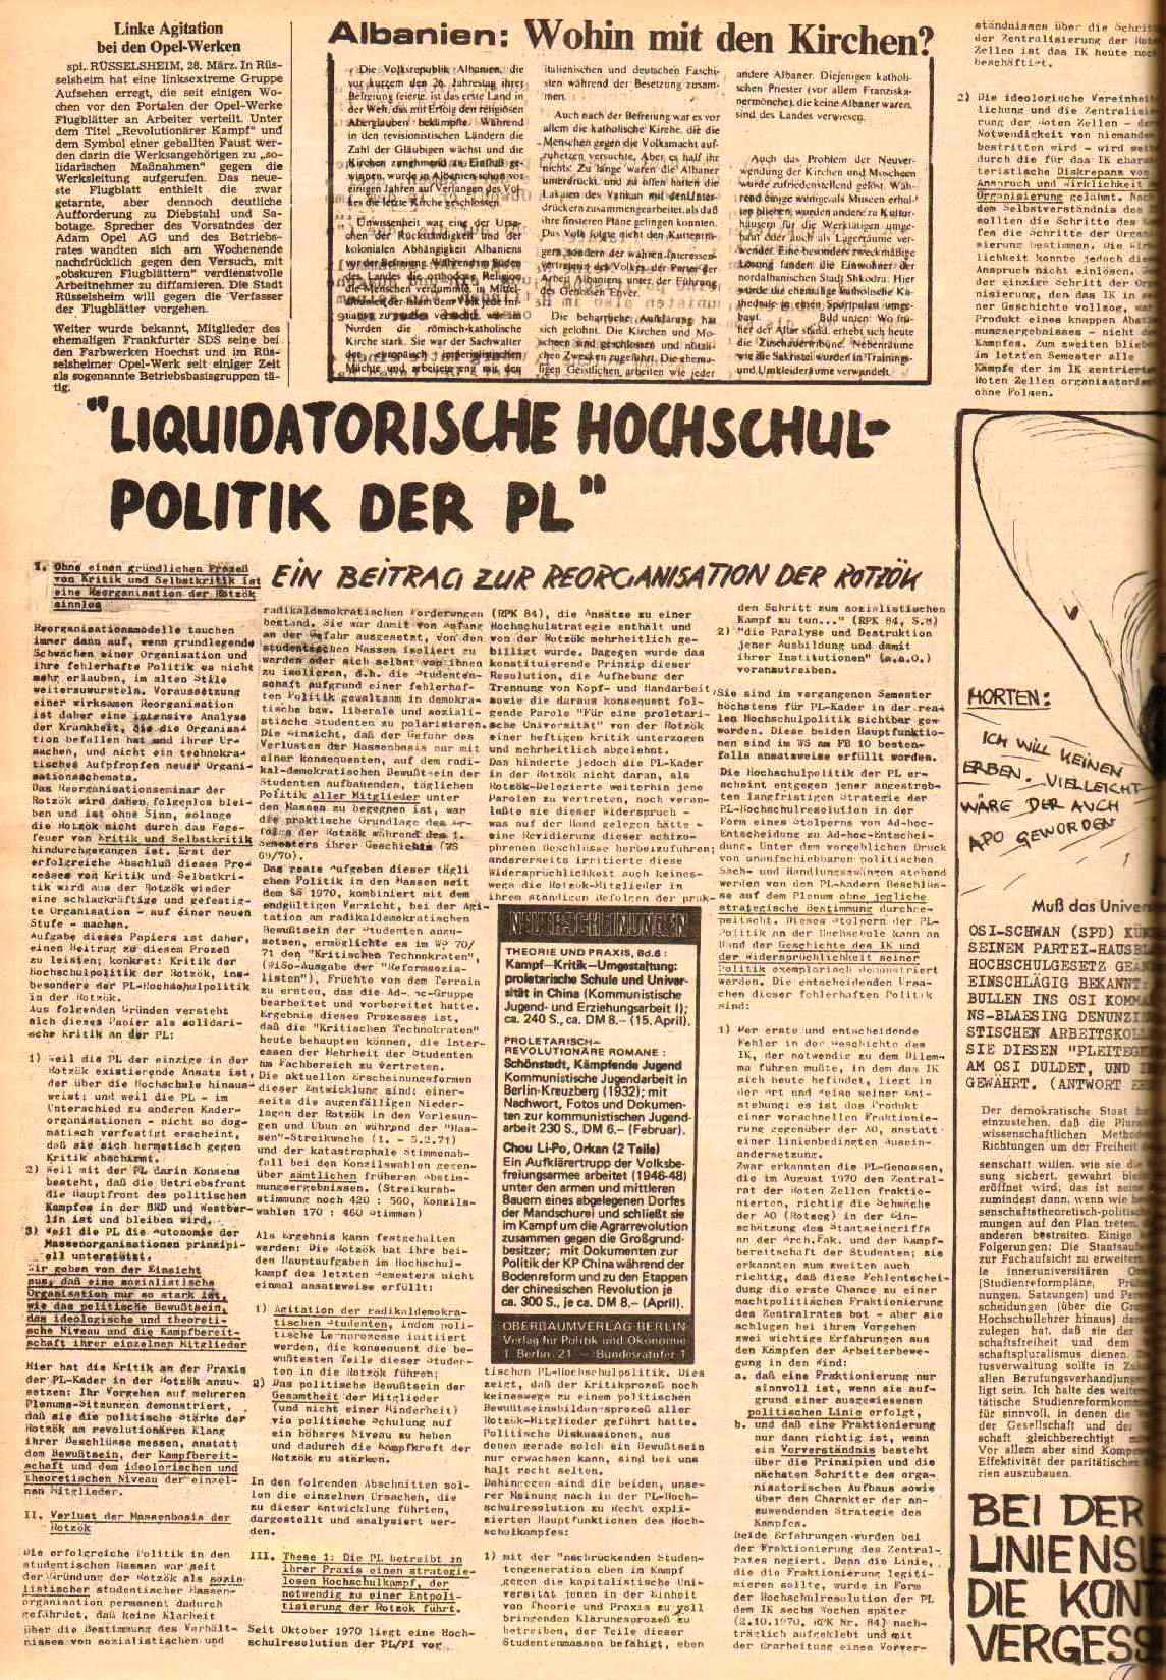 Berlin_Hochschulkampf_1971_06_06